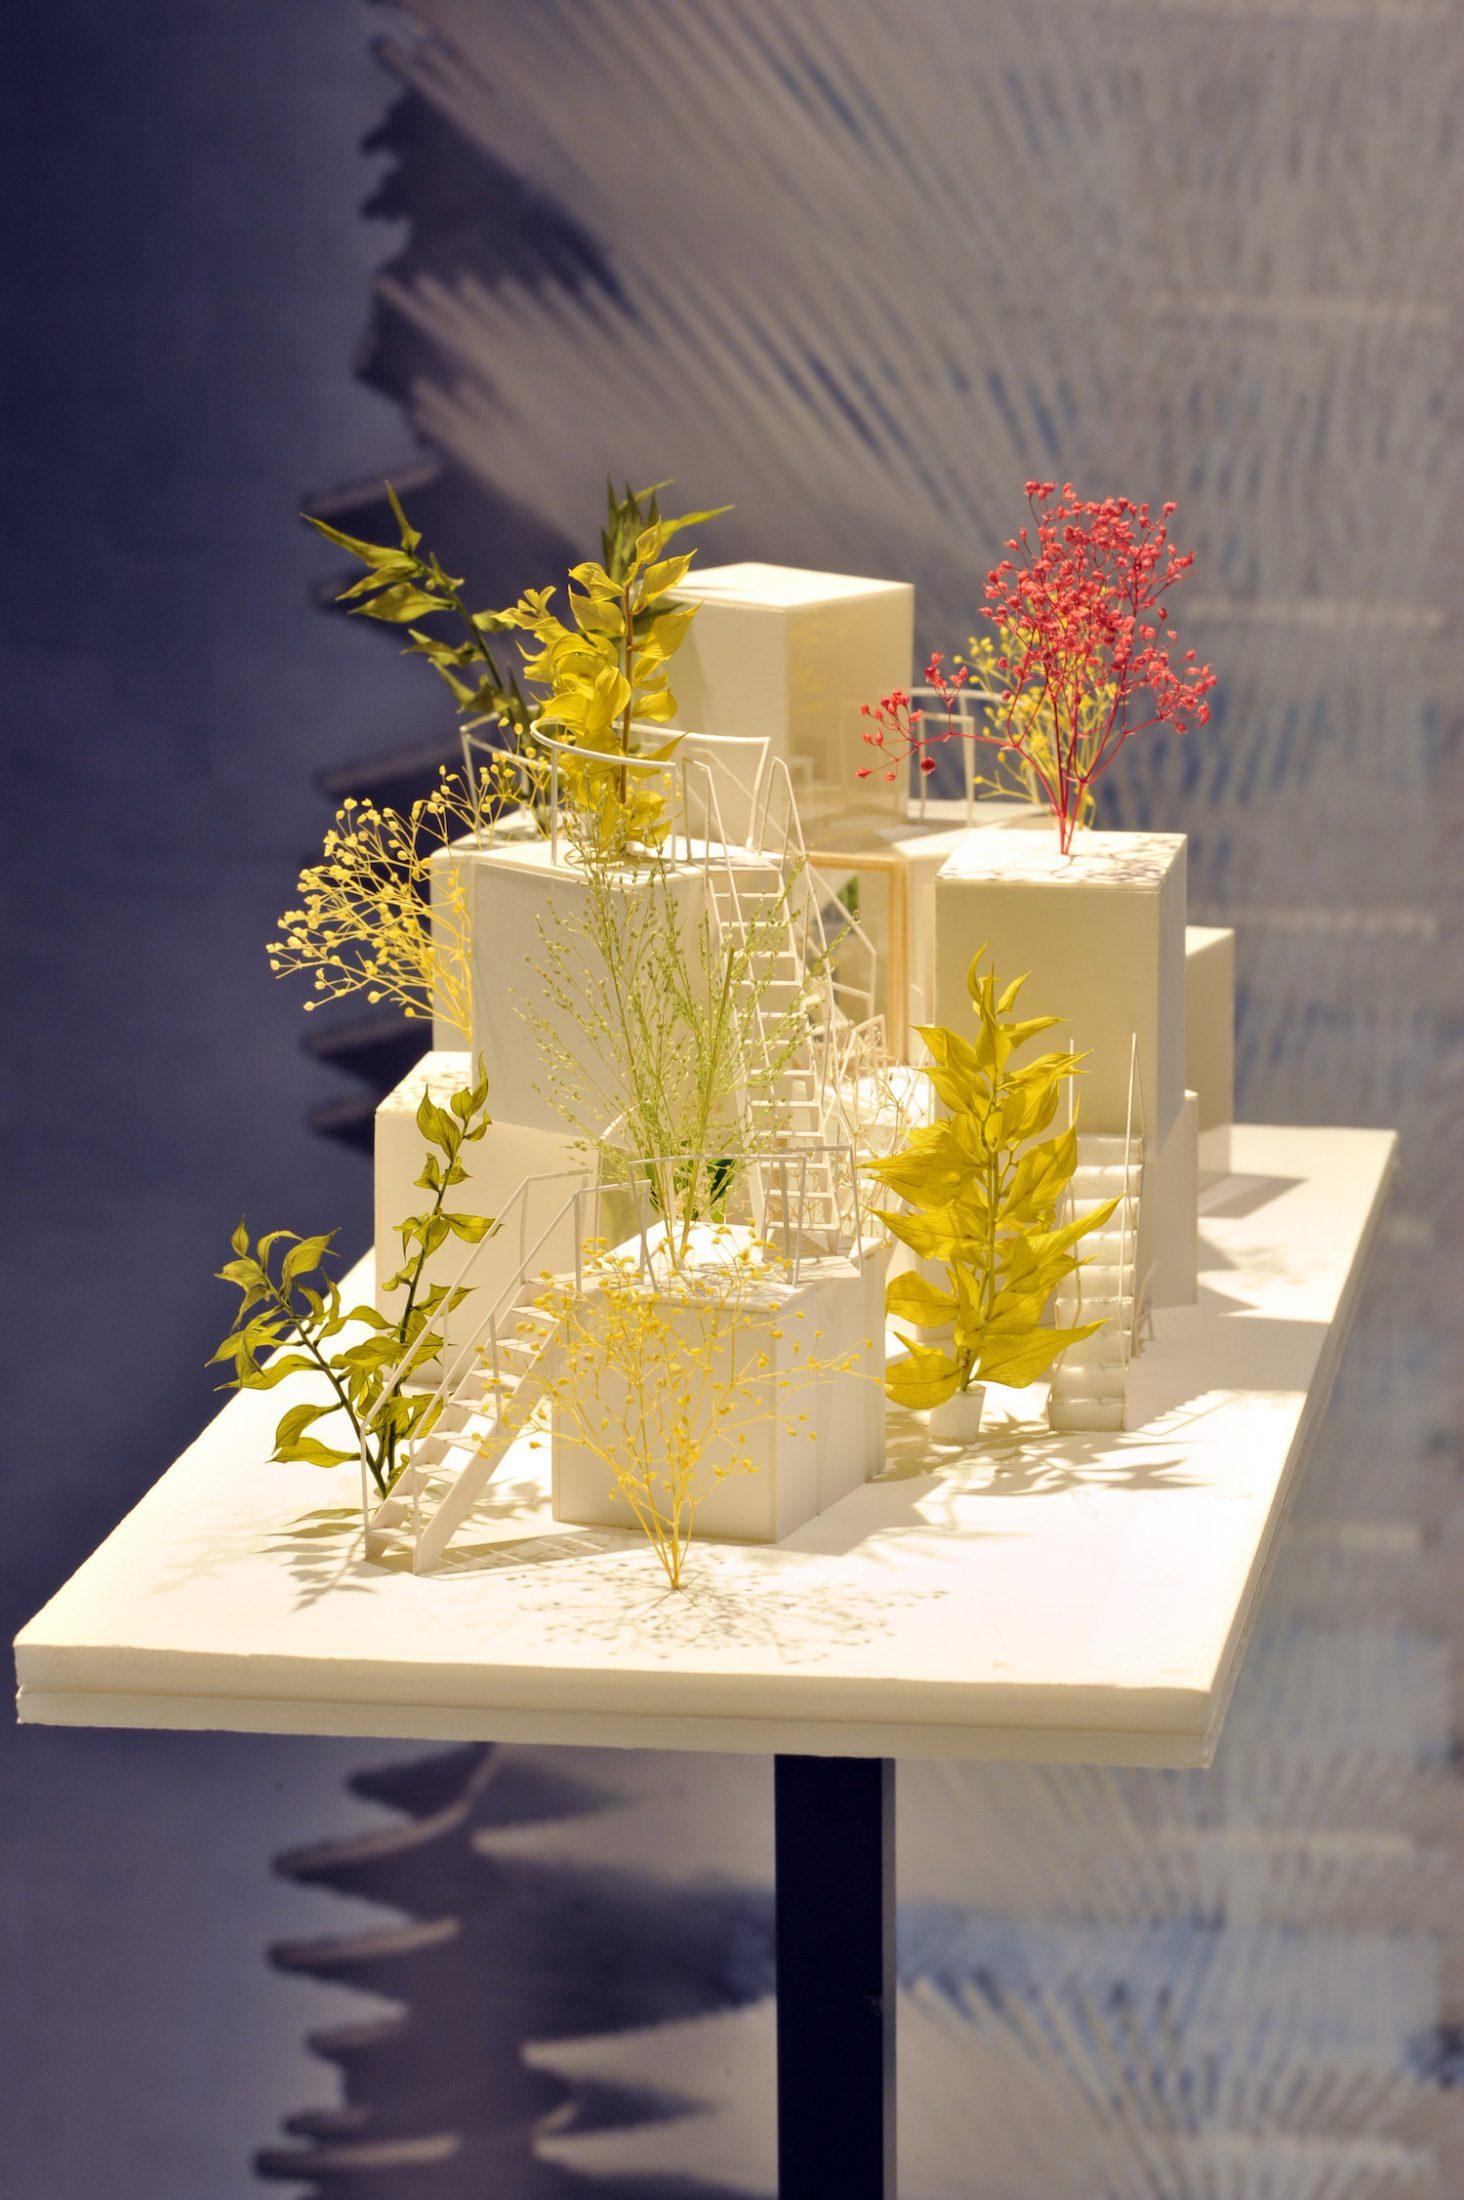 Exhibition - Japan House London - Humphrey Munson Blog